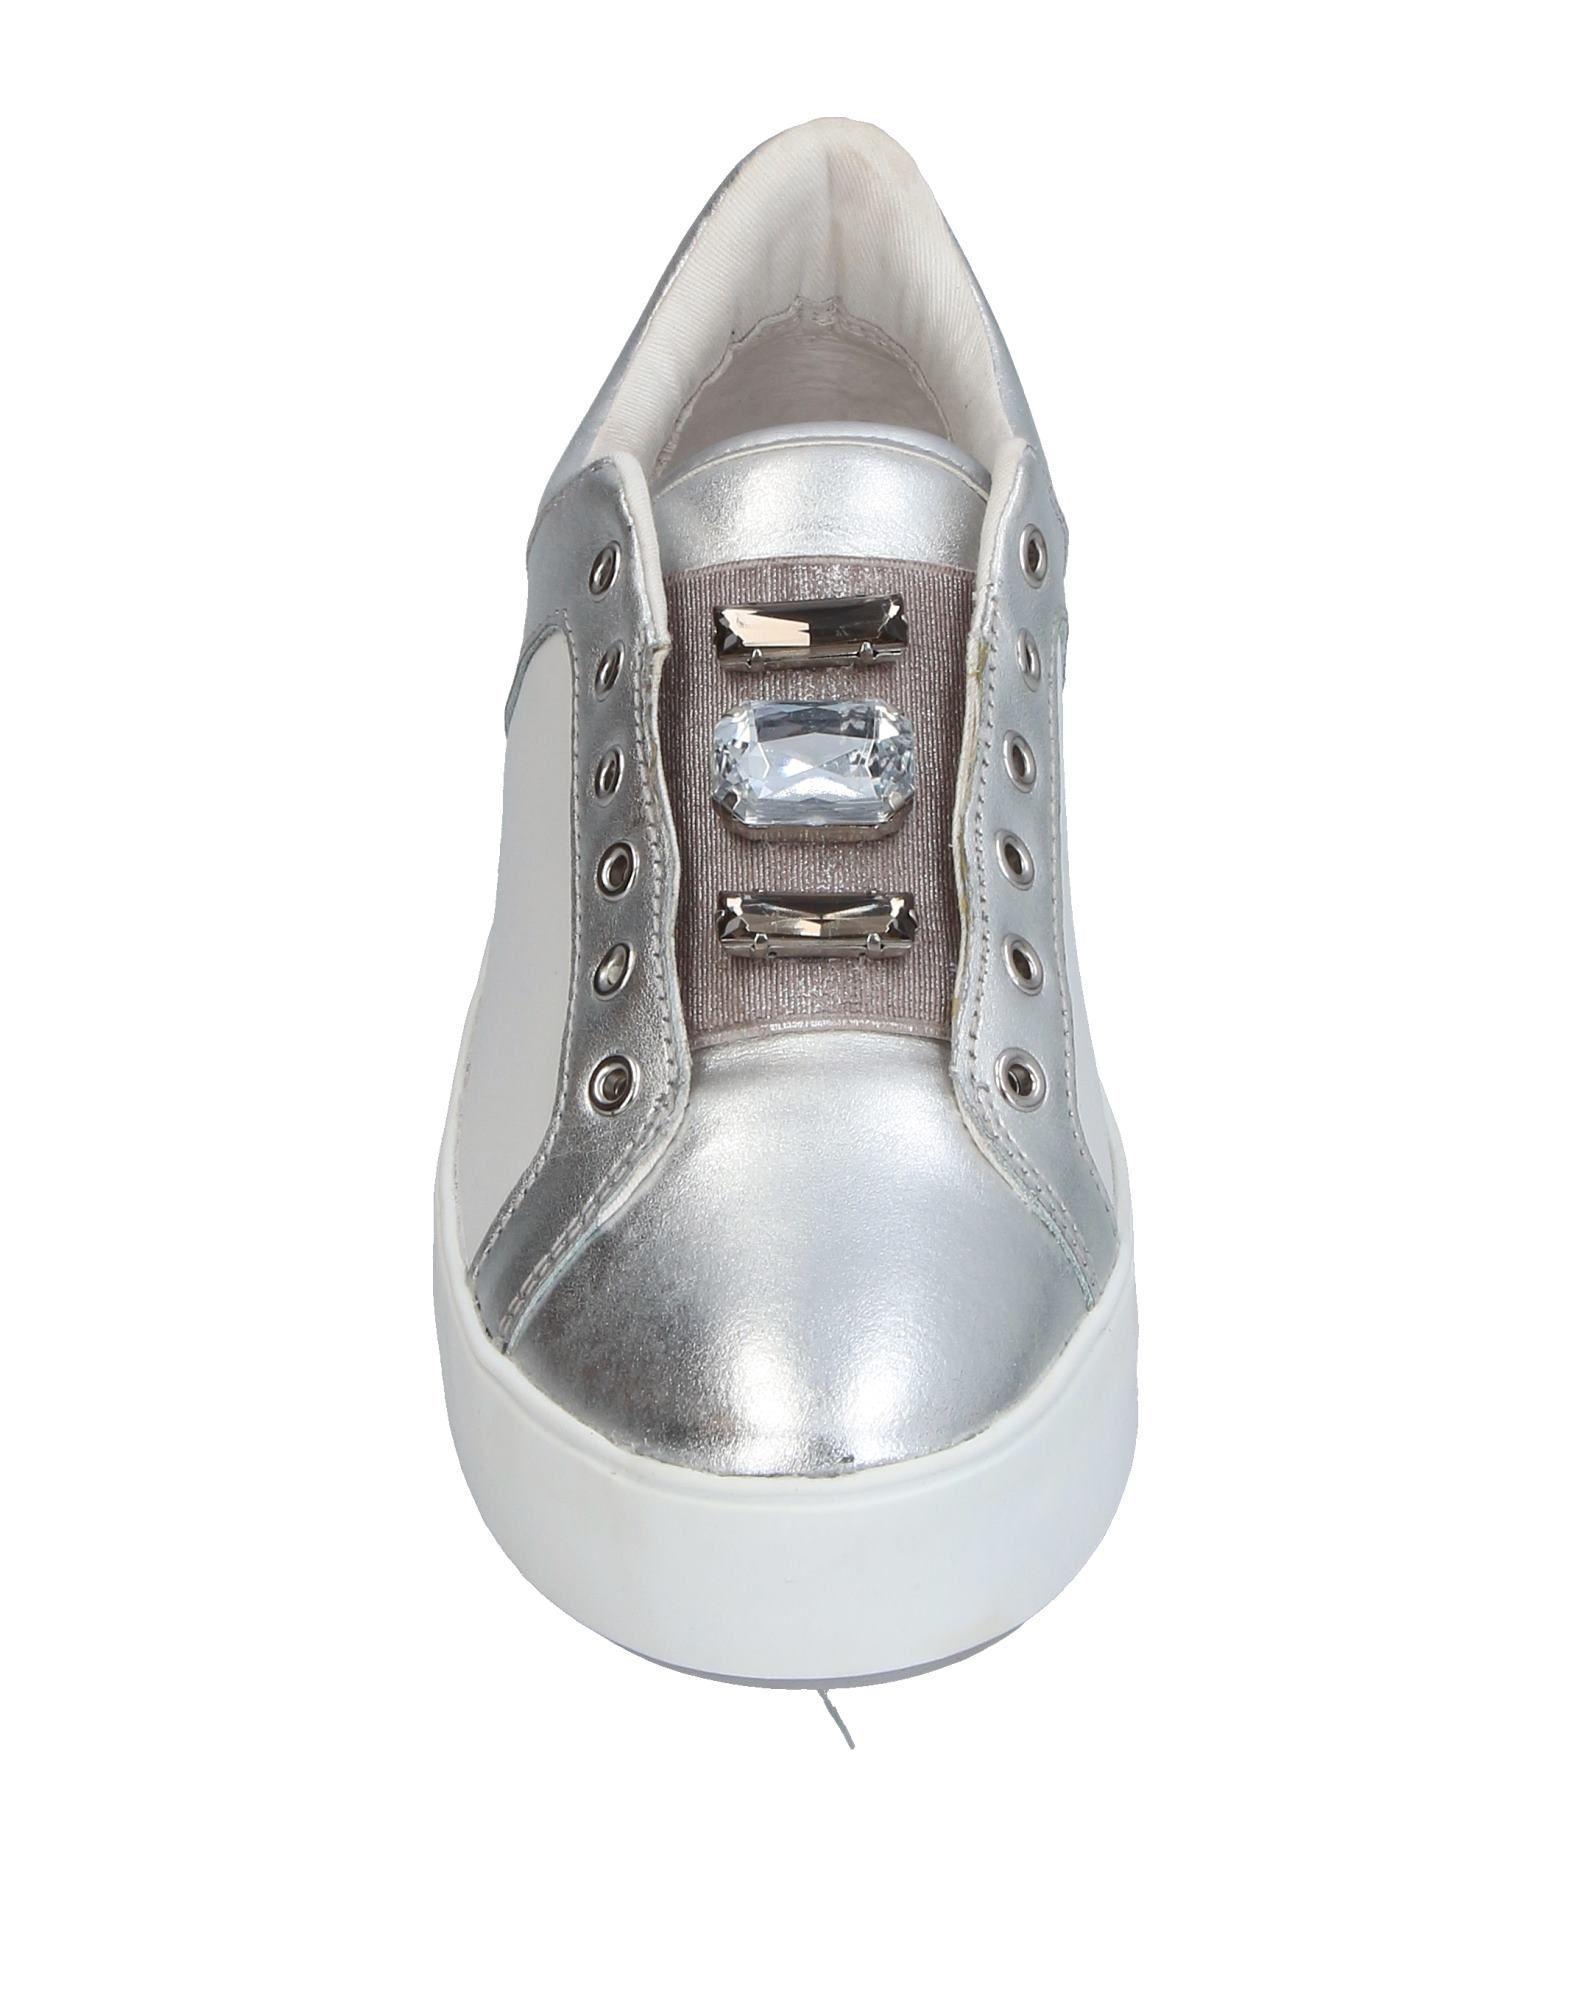 Apepazza Rubber Low-tops & Sneakers in Silver (Metallic)